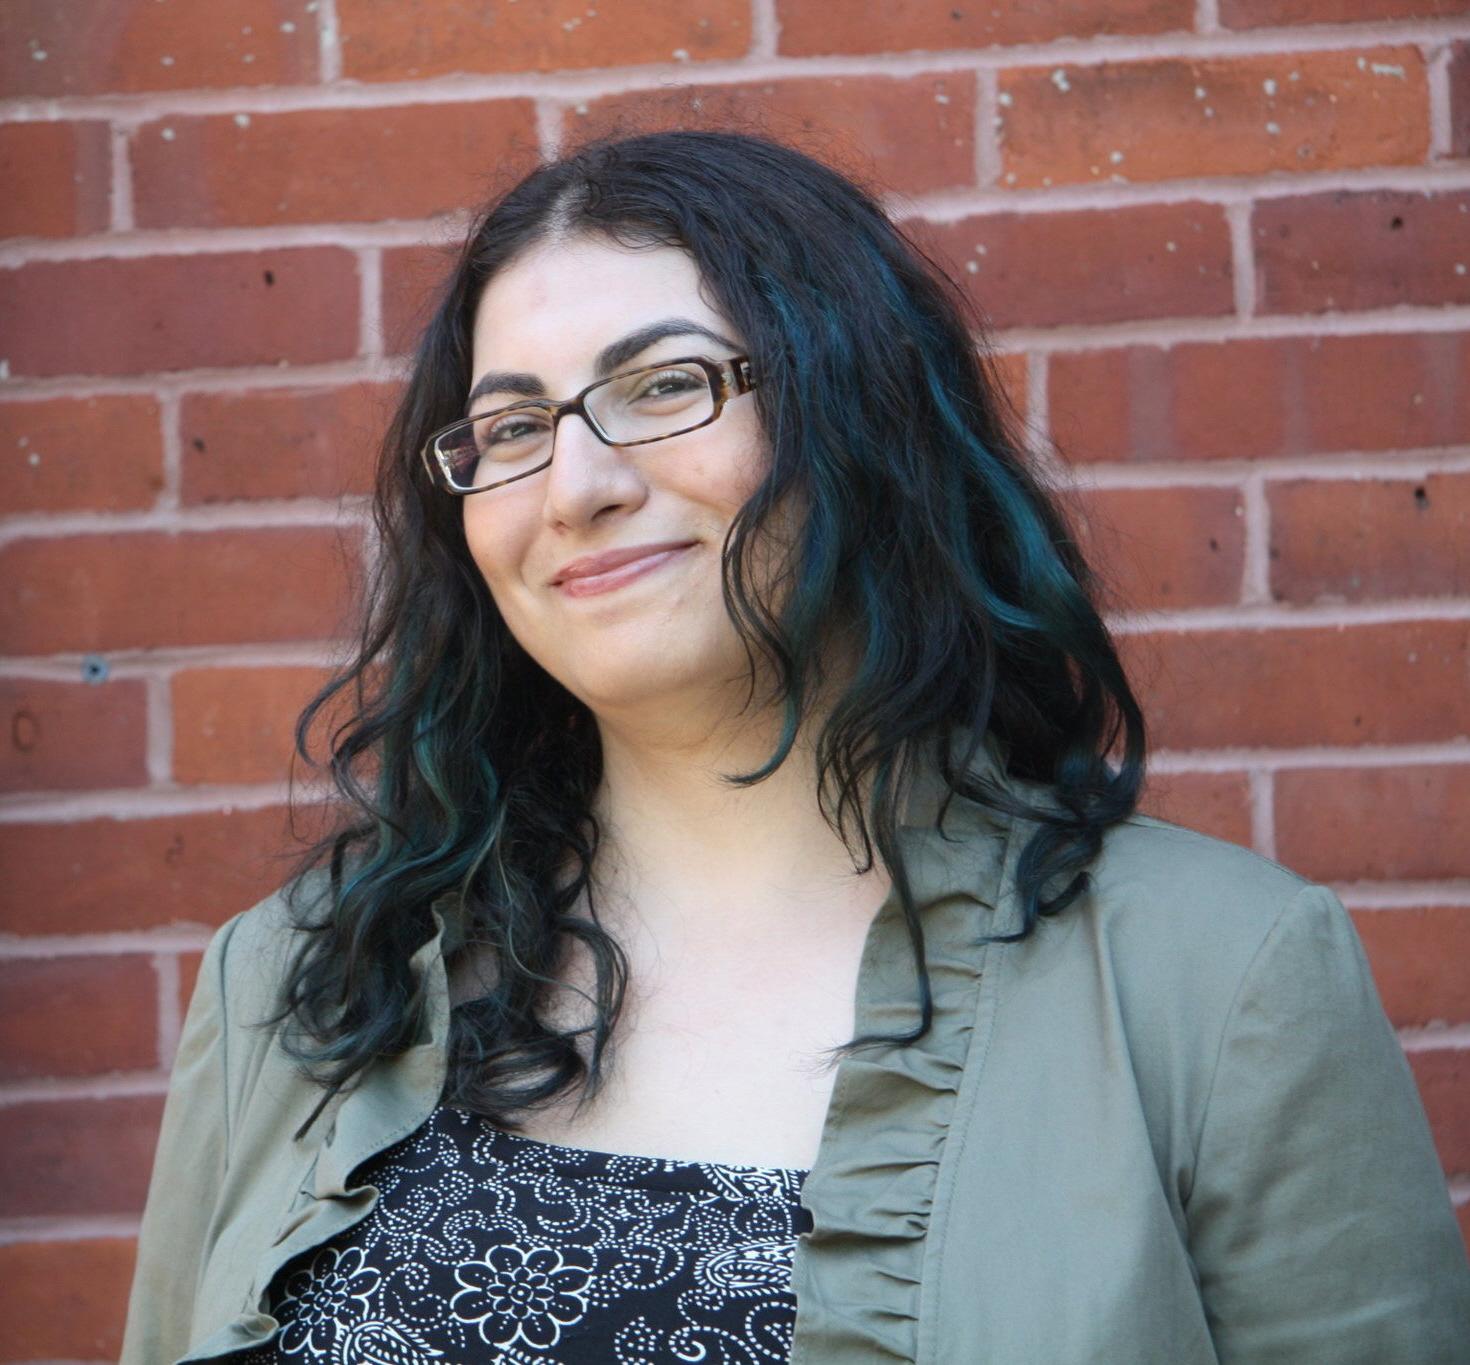 Author photo courtesy of Leah Bobet